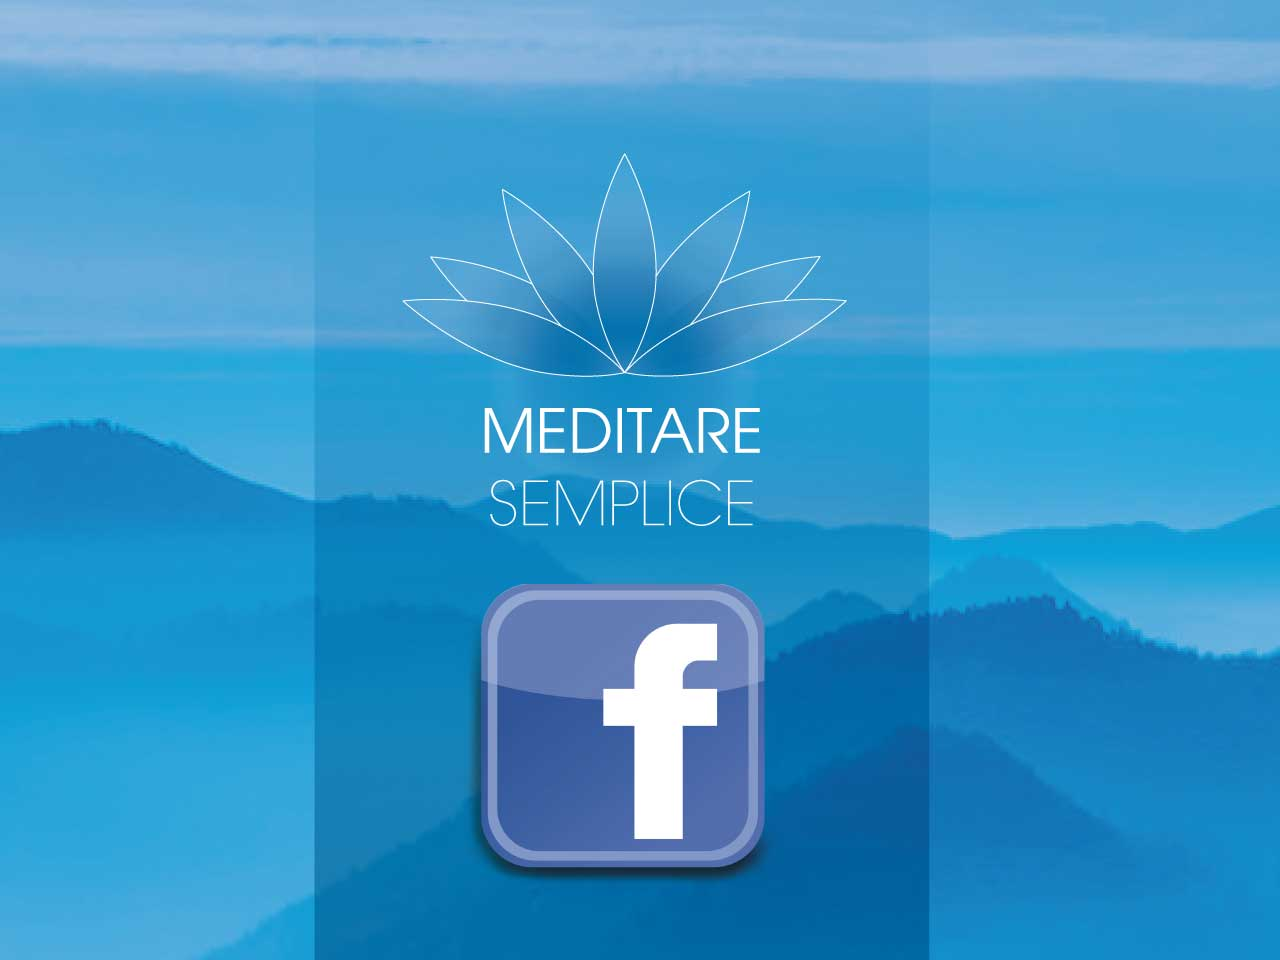 https://meditaedanza.com/wp-content/uploads/2020/12/meditare-semplice-facebook.jpg